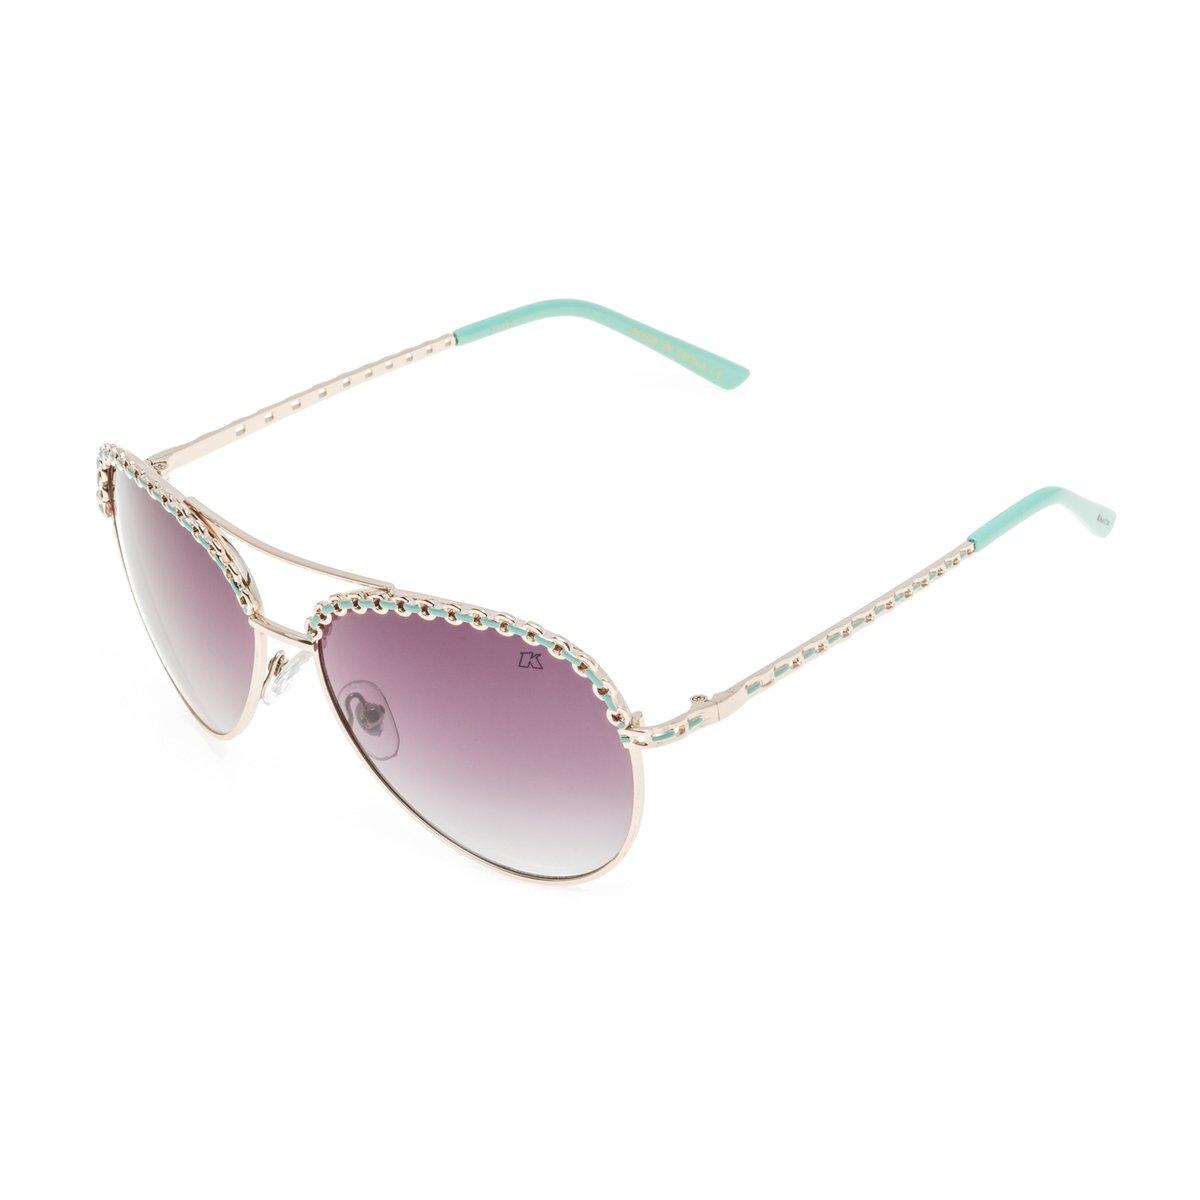 Óculos de Sol Khatto KT21118 - Compre Agora   Netshoes d581baf401